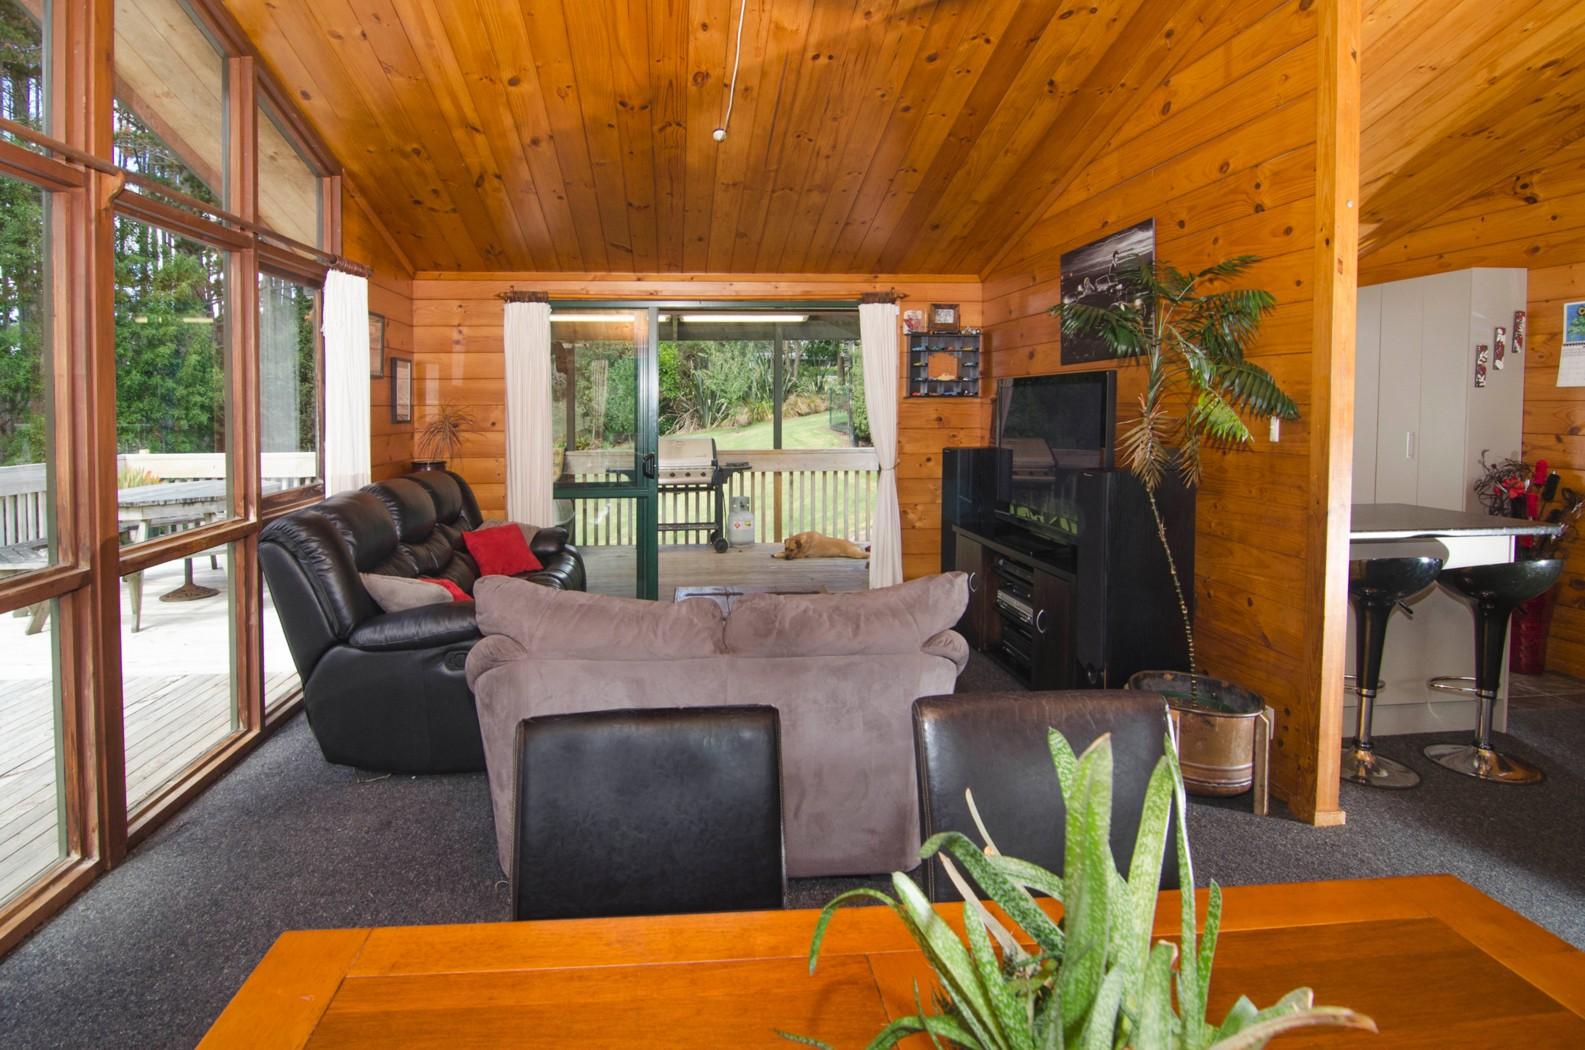 763 state highway 16 waimauku rodney 0812 sold house ray